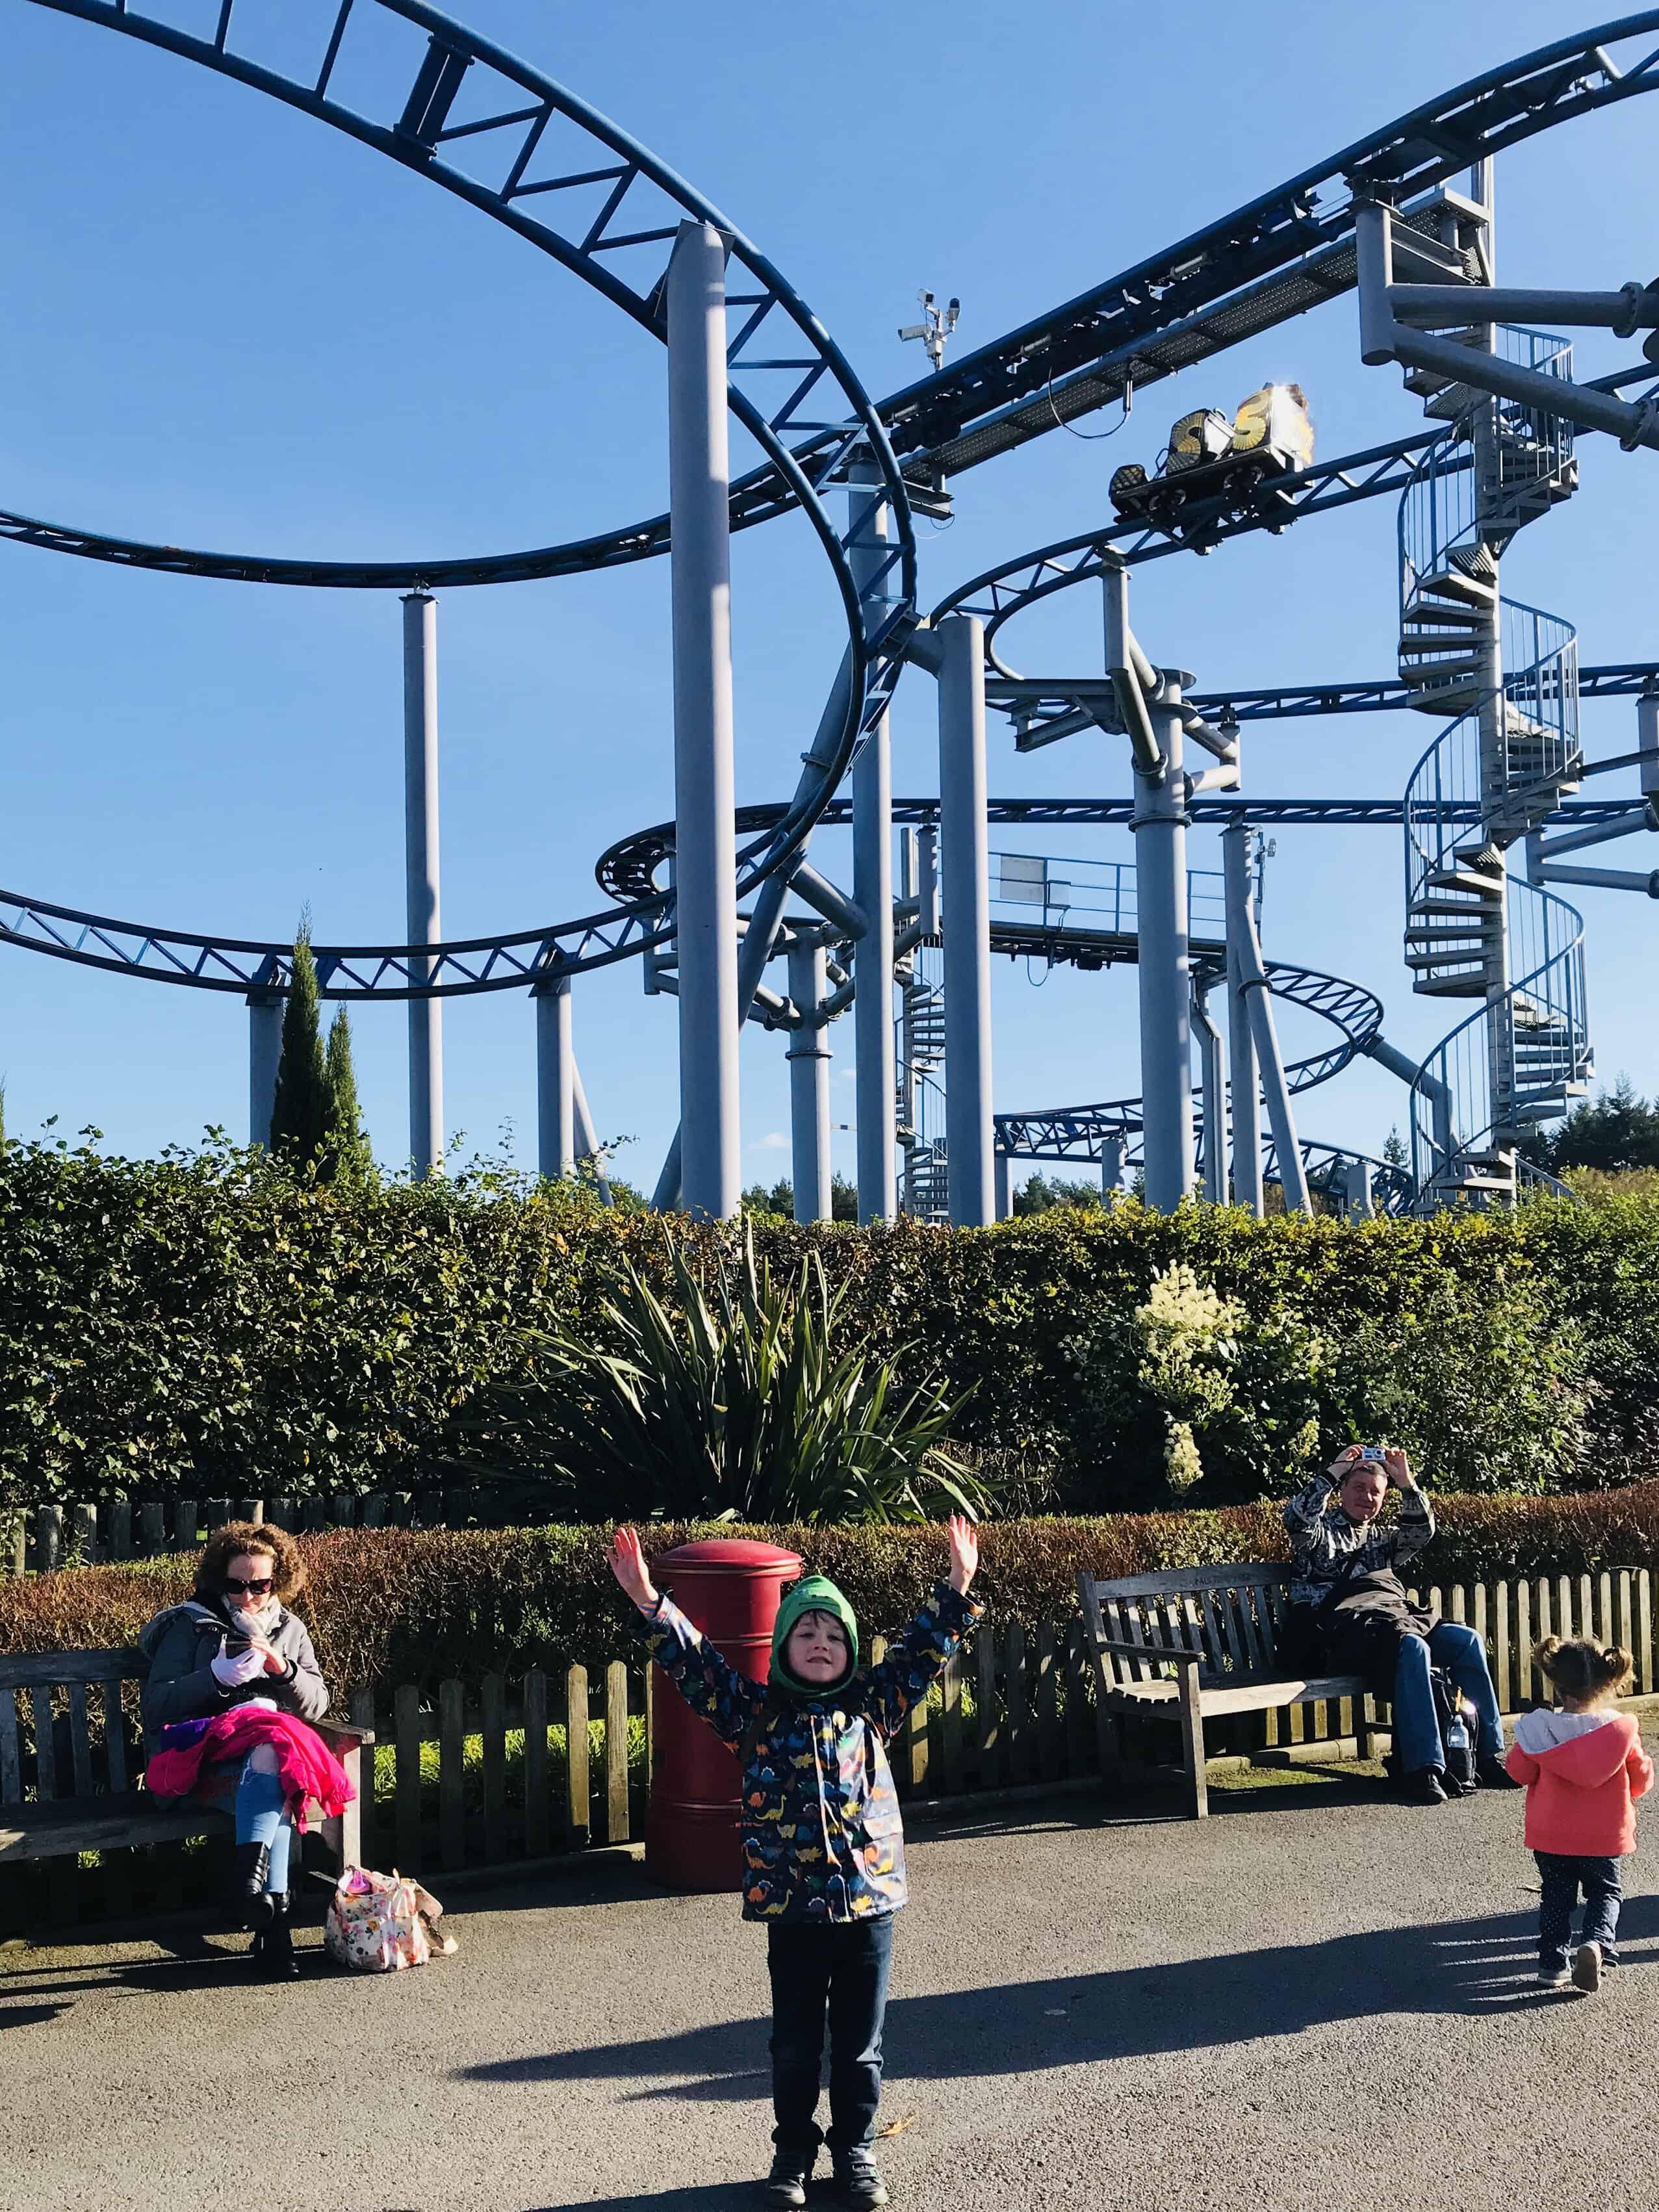 Cobra Rollercoaster at Paulton's Park